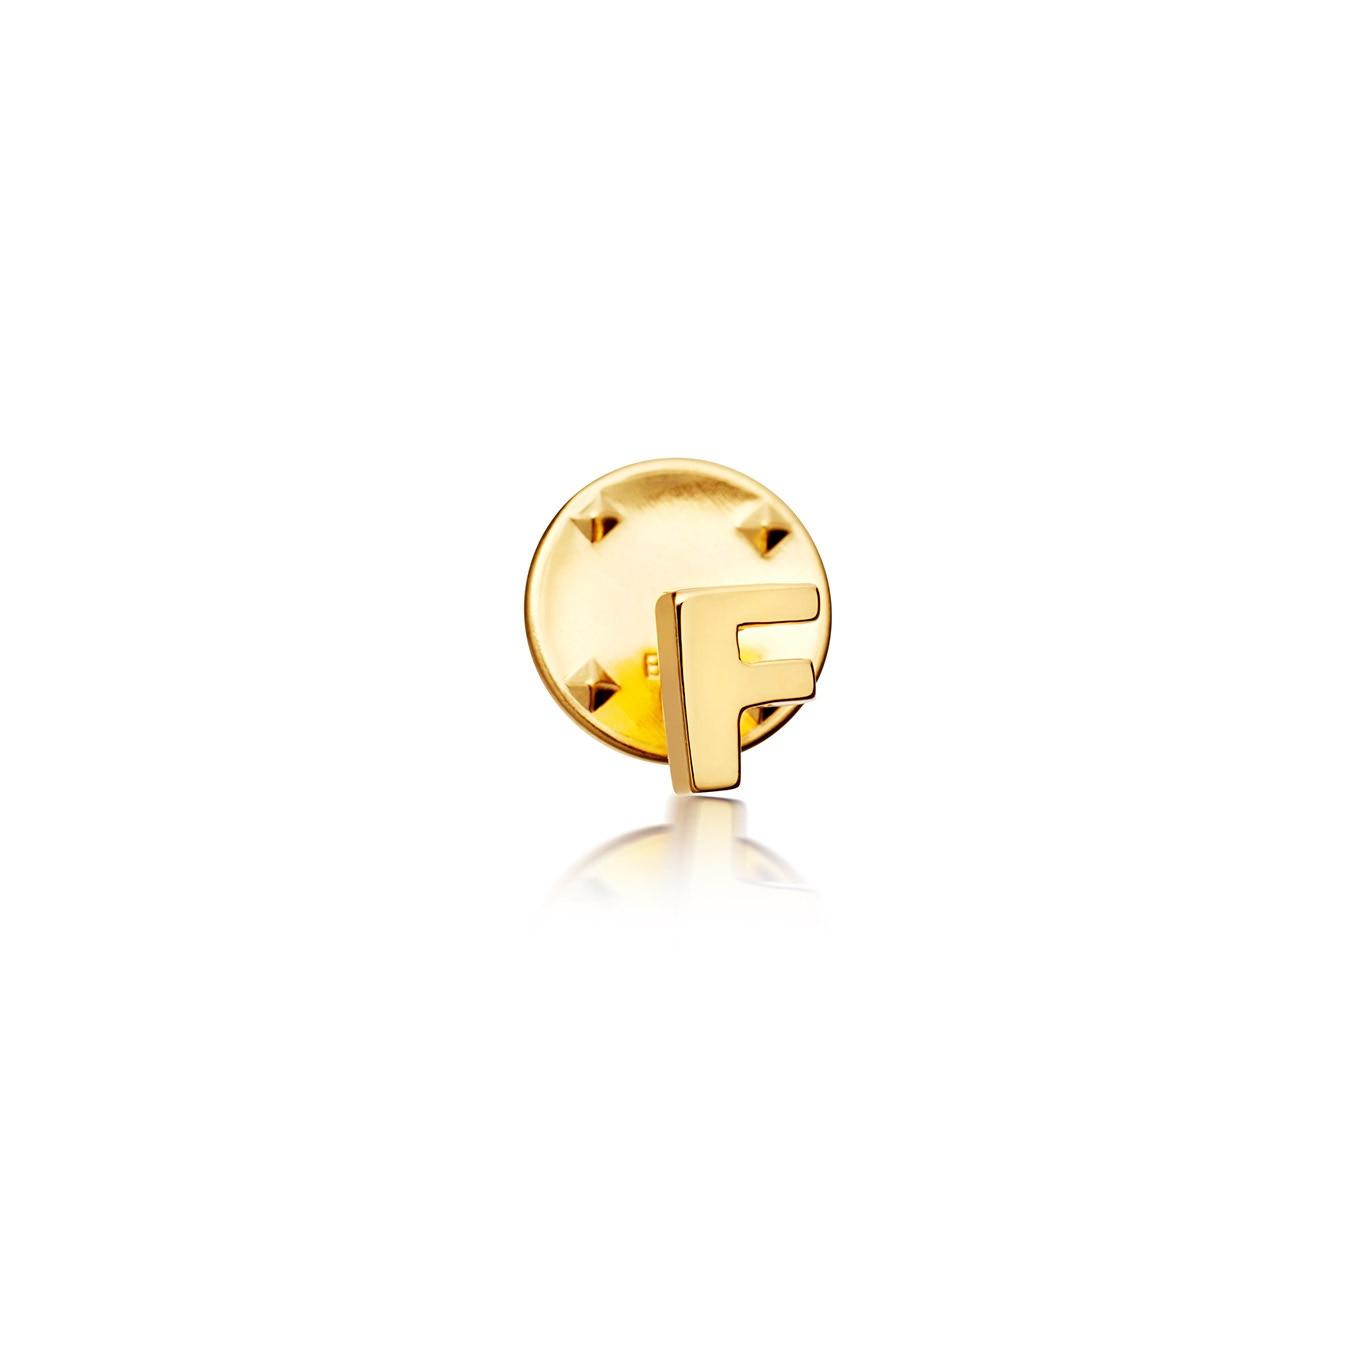 Initial 'F' Biography Pin